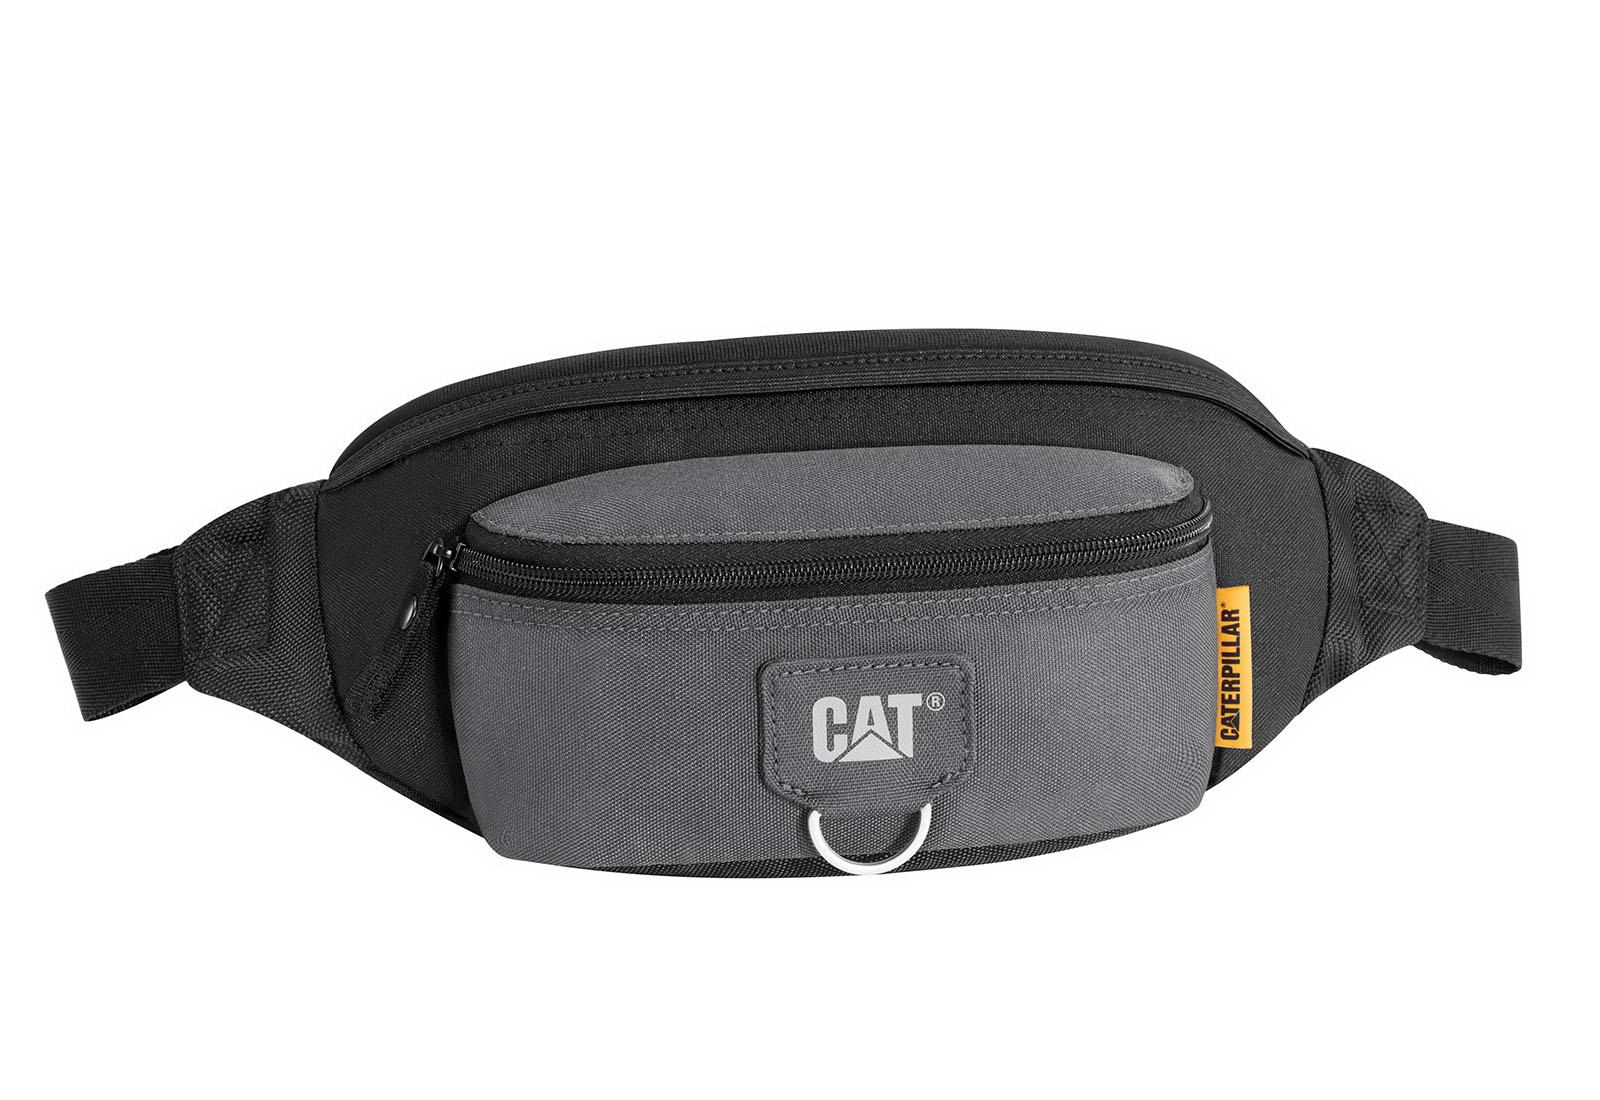 CAT torba Raymond Black Anthracite Co